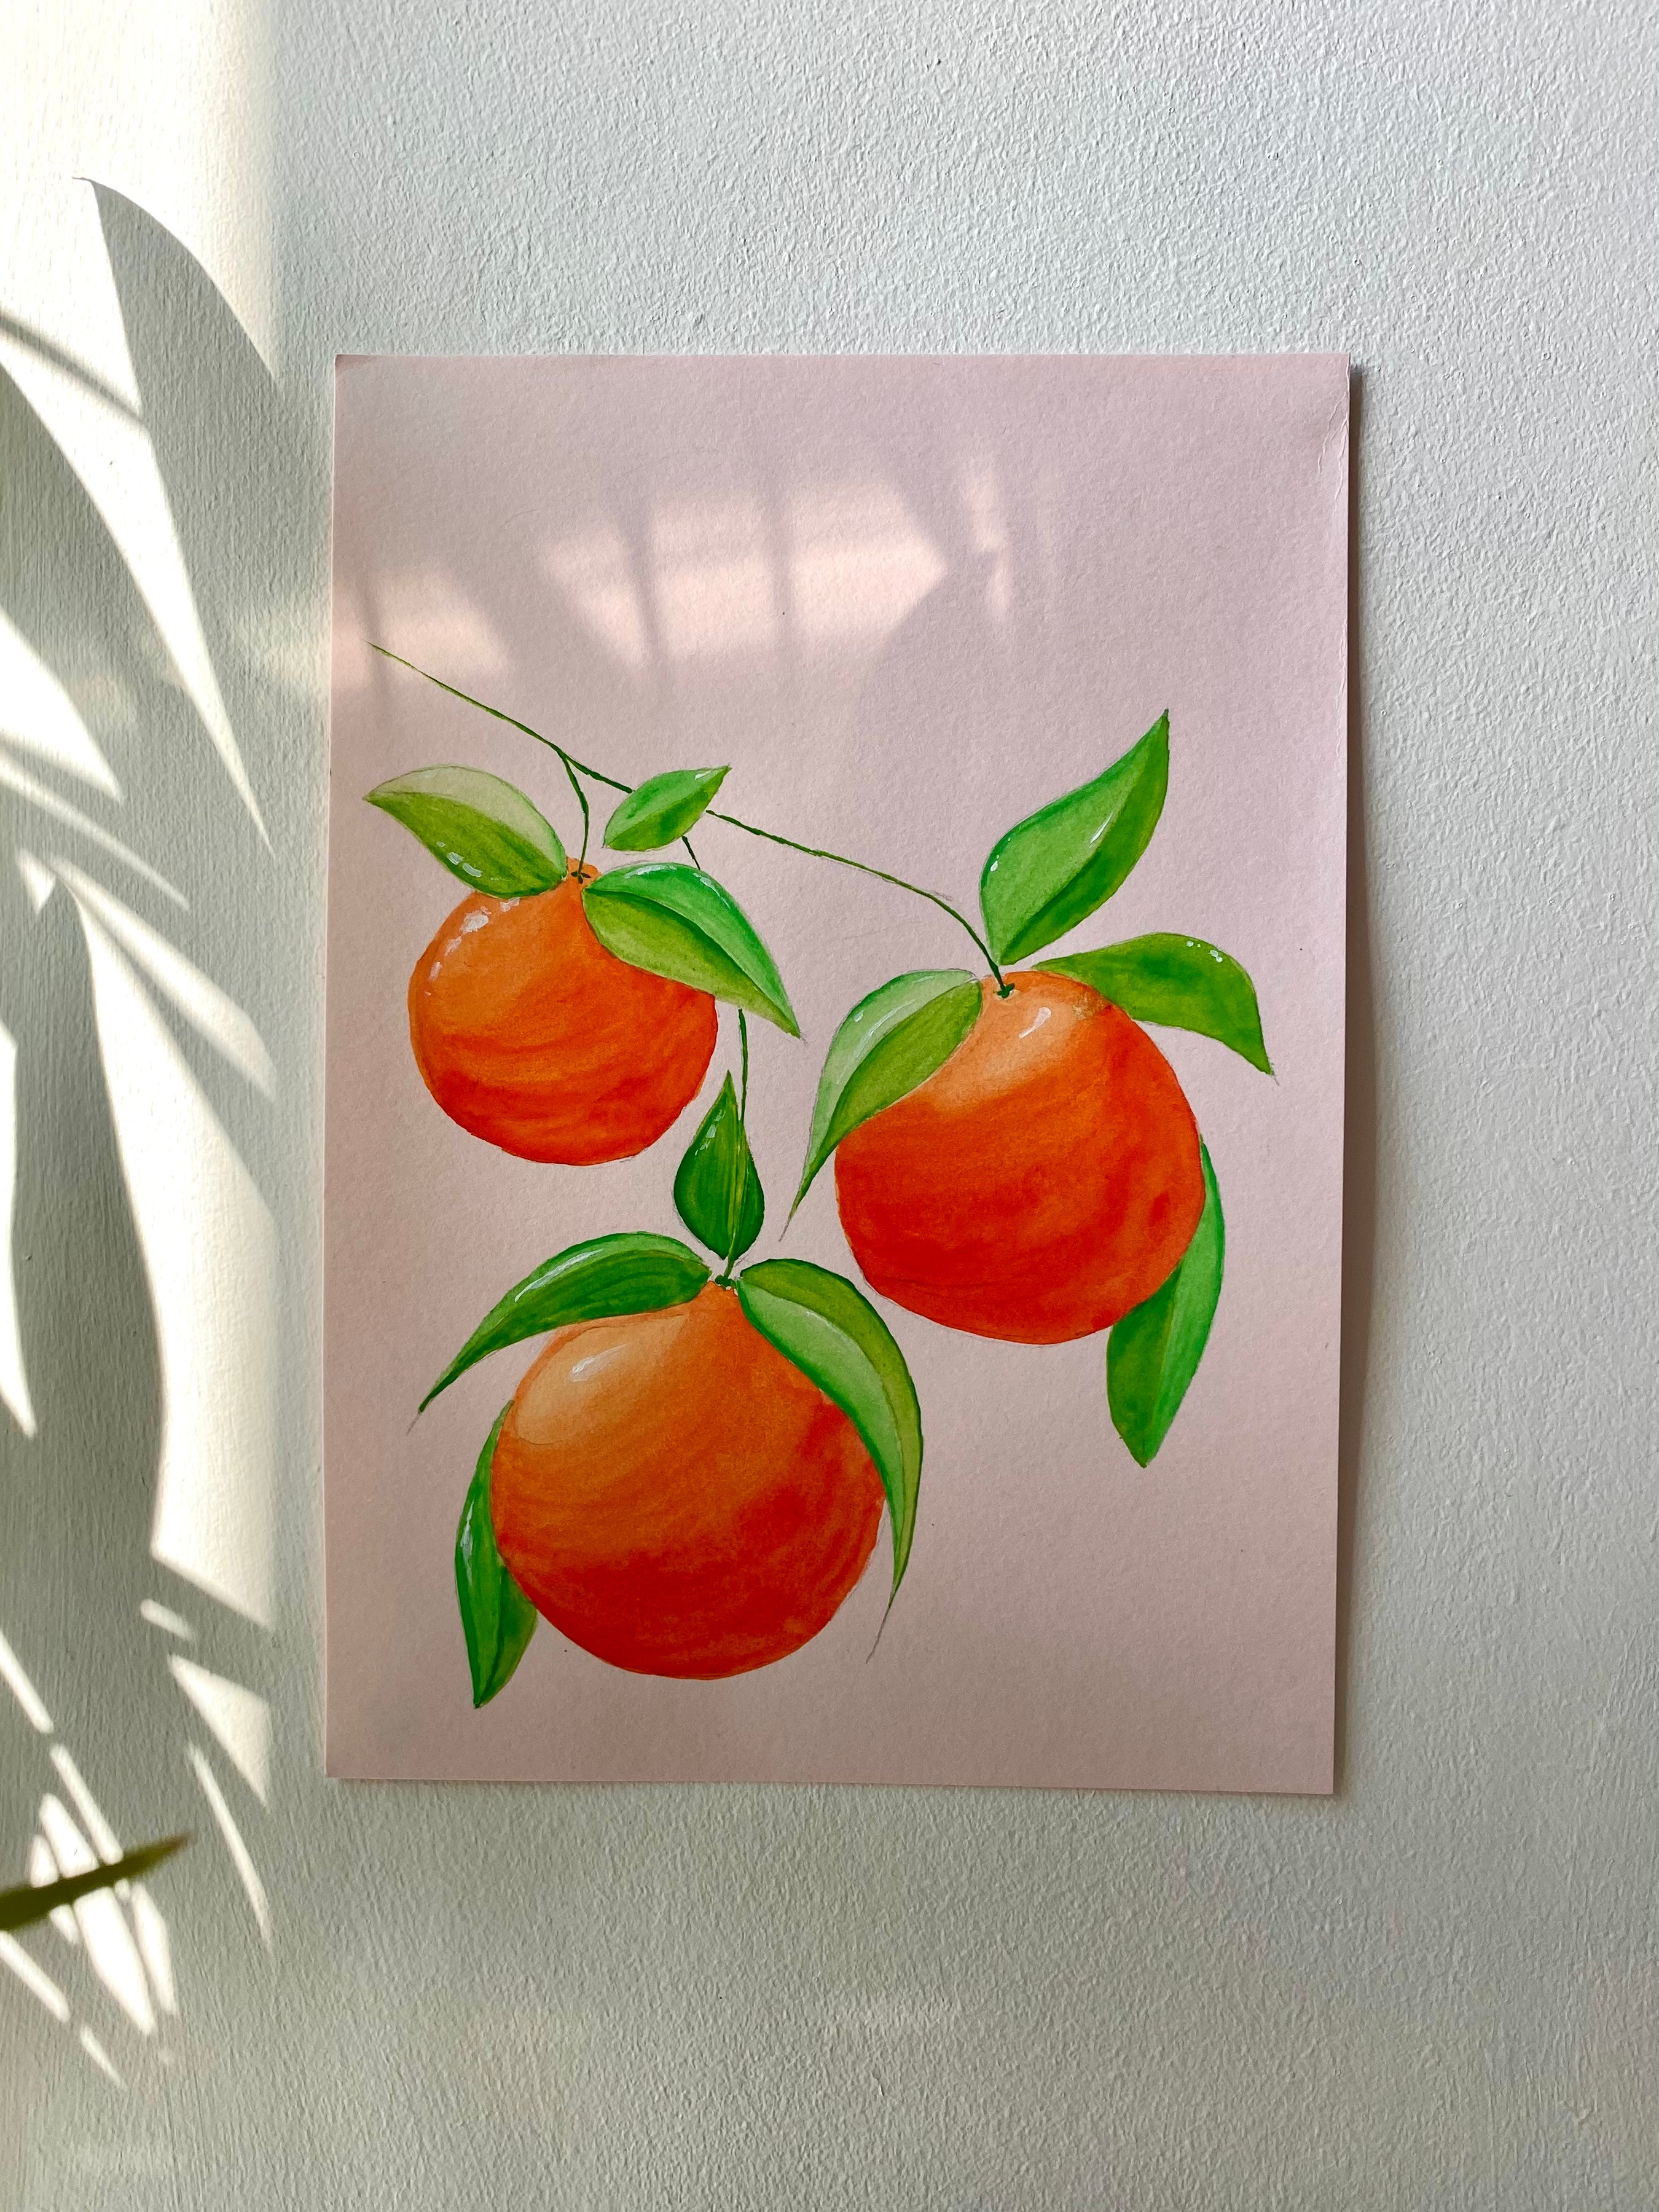 Summer Oranges Painting Class